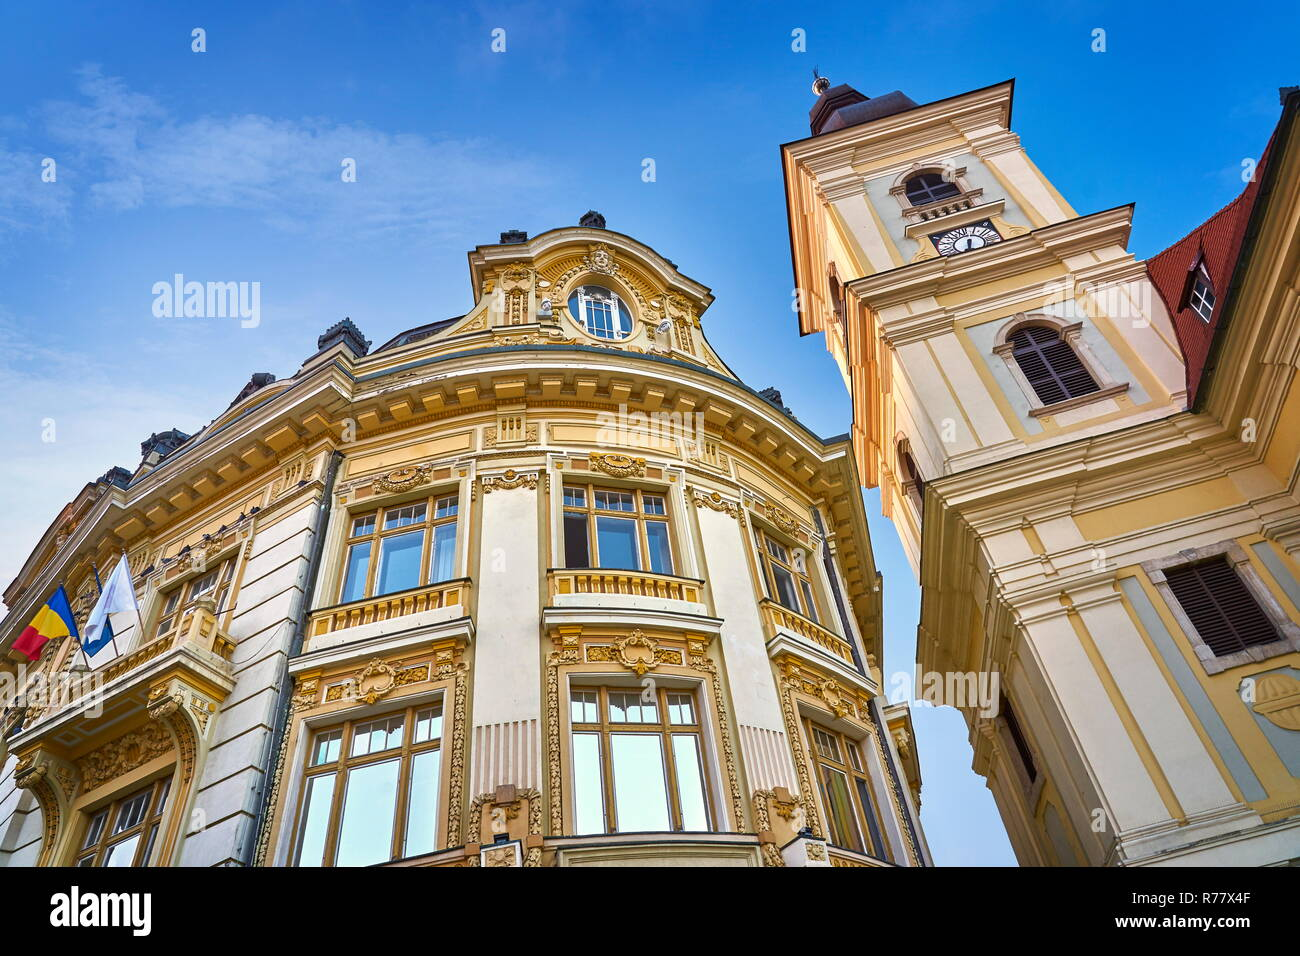 City Hall in Large Square, Sibiu, Transylvania, Romania - Stock Image